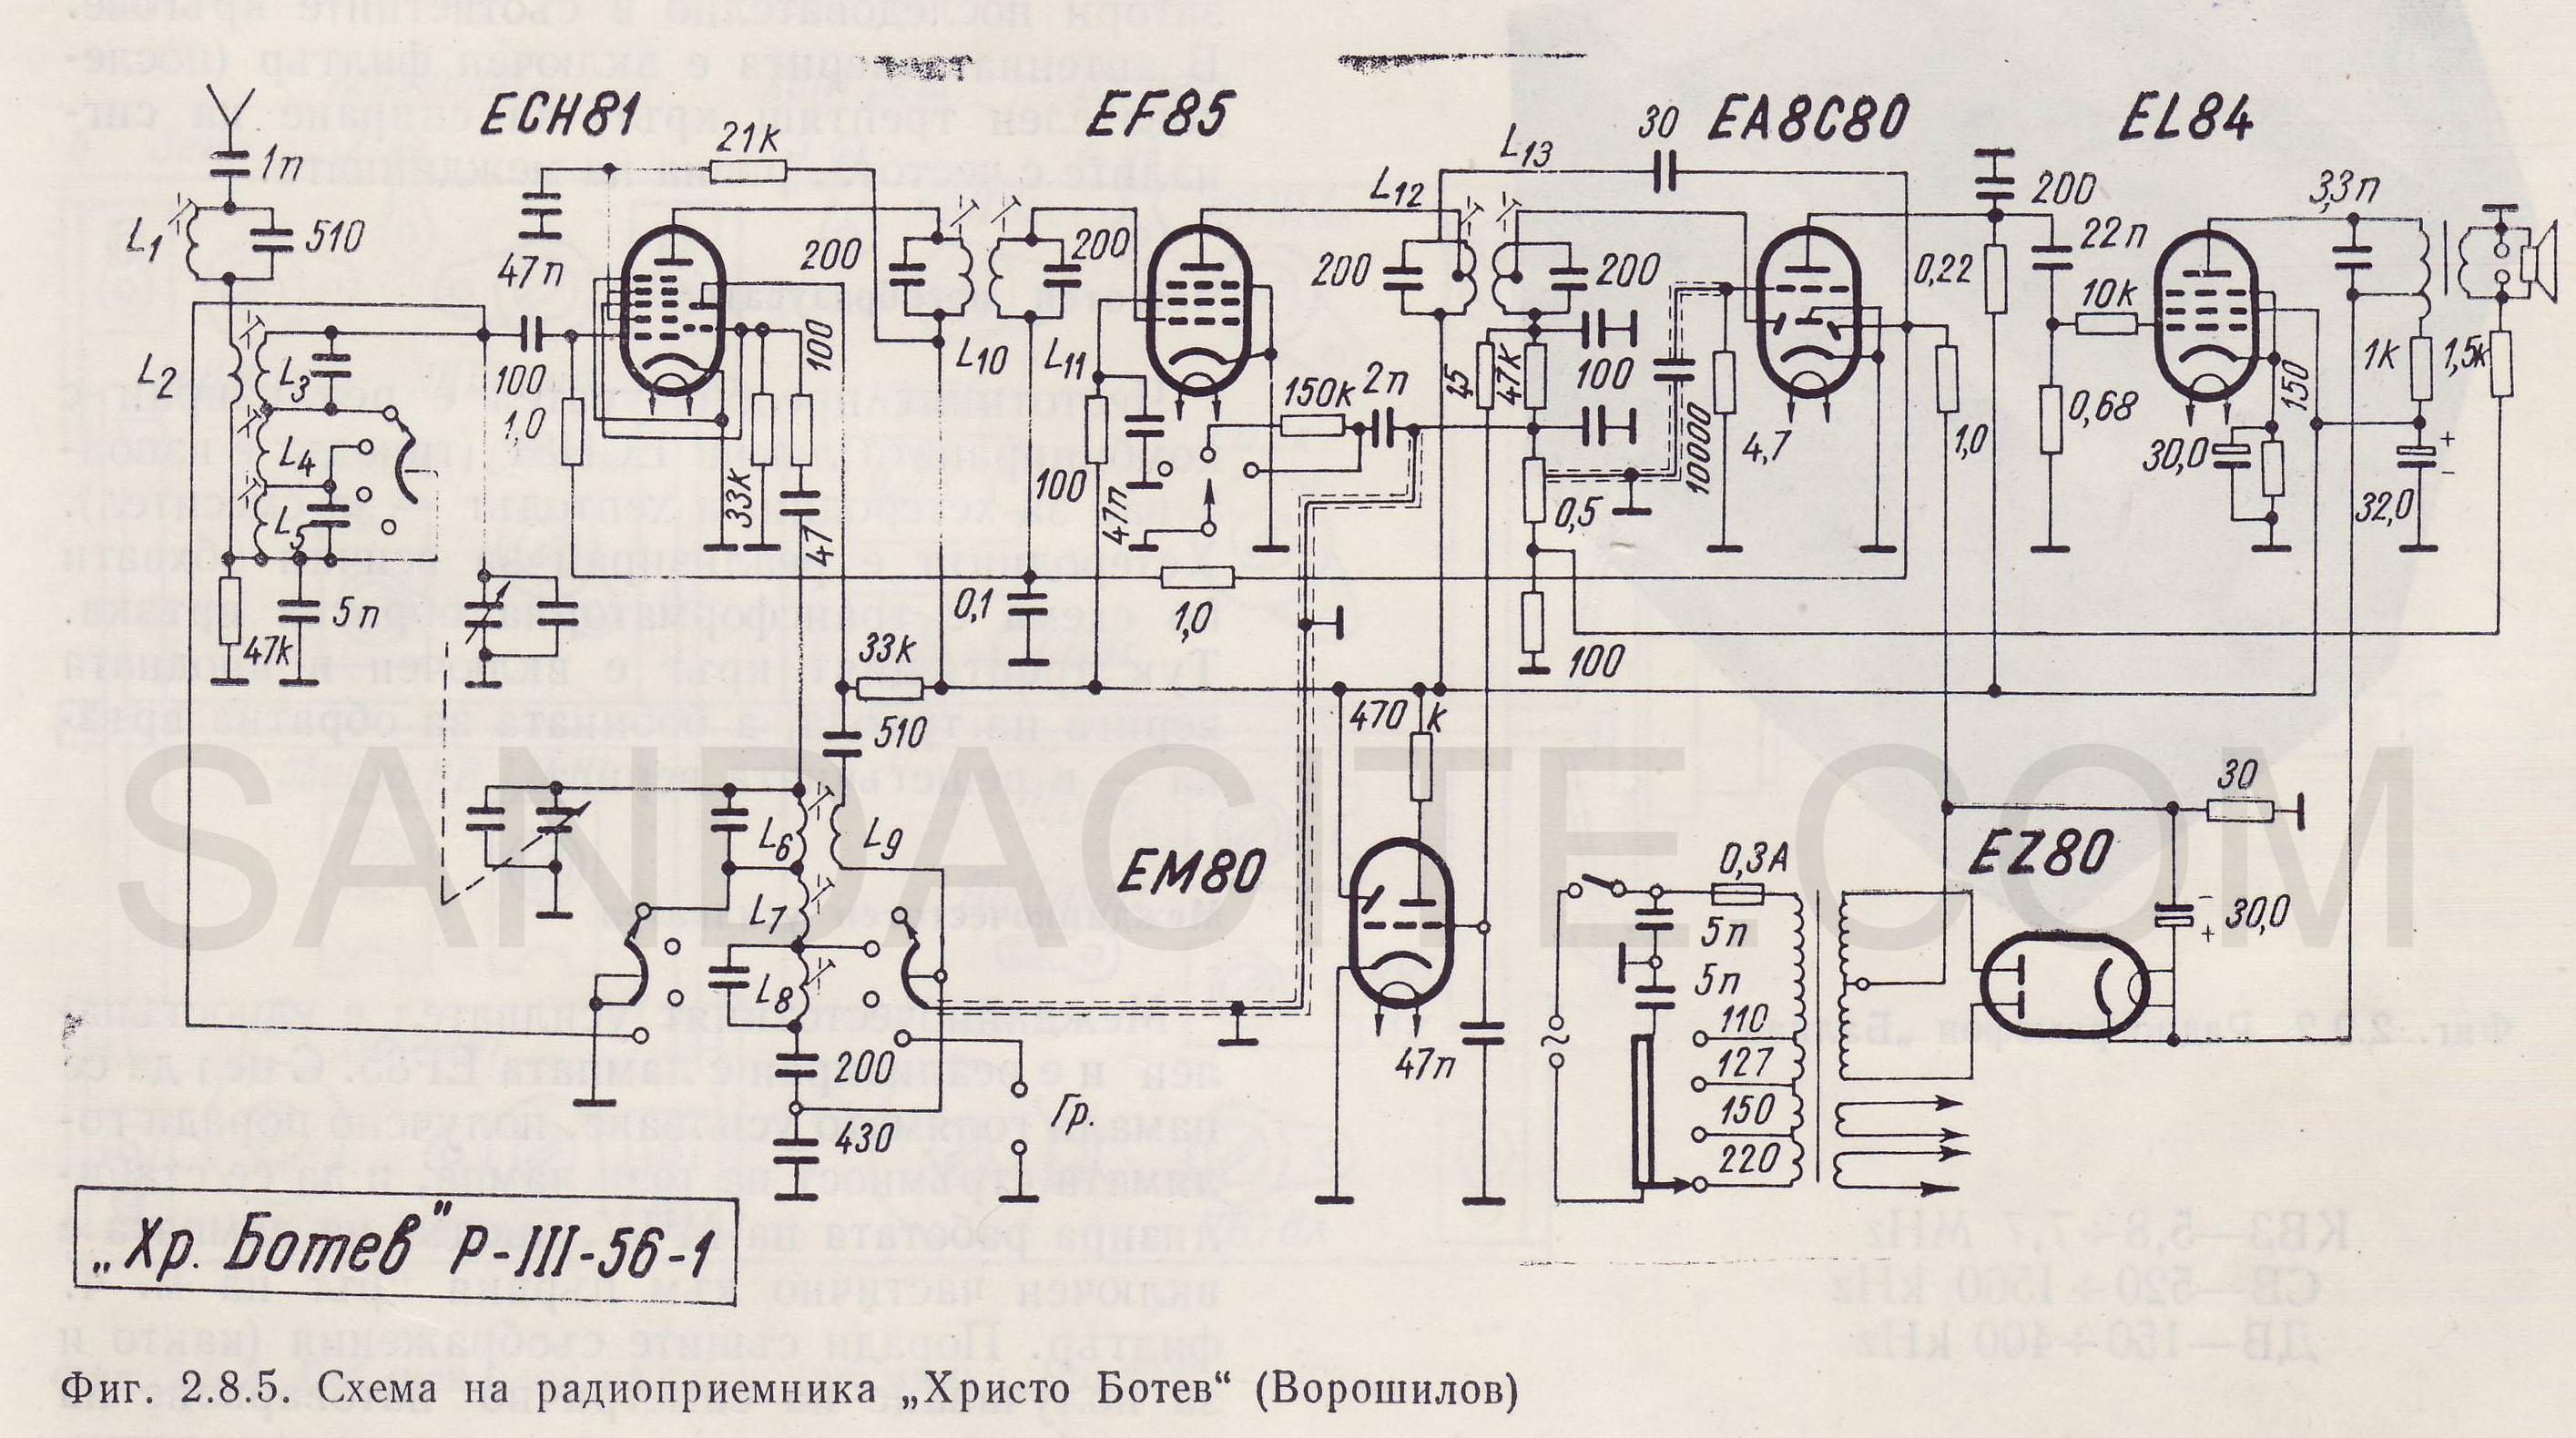 Христо Ботев Р-III-56-1